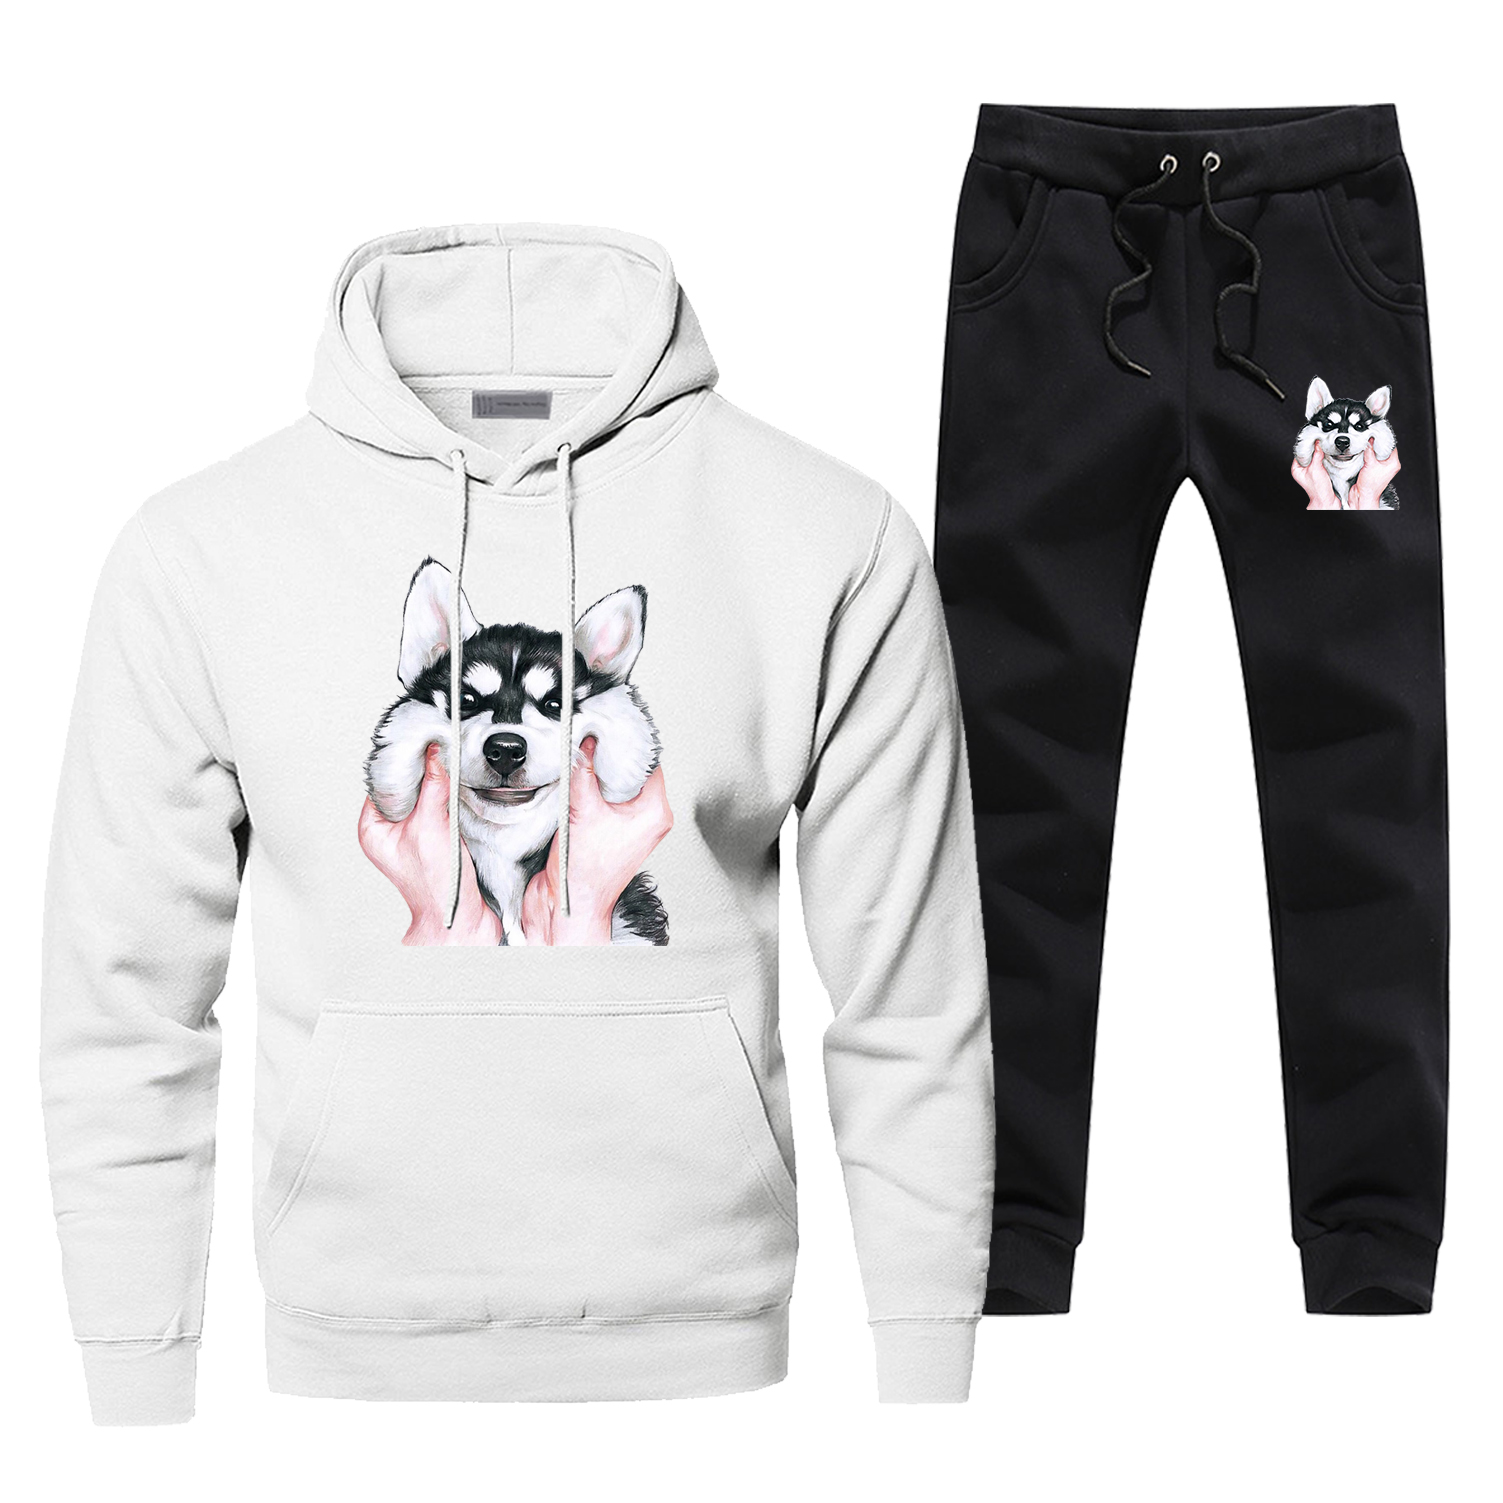 2019 Winter Lovely Dog Print Men's Sets Casual Funny Husky Sportsman Wear Pets Fashion Pants Sweatshirts Warm Animal Sweatpants